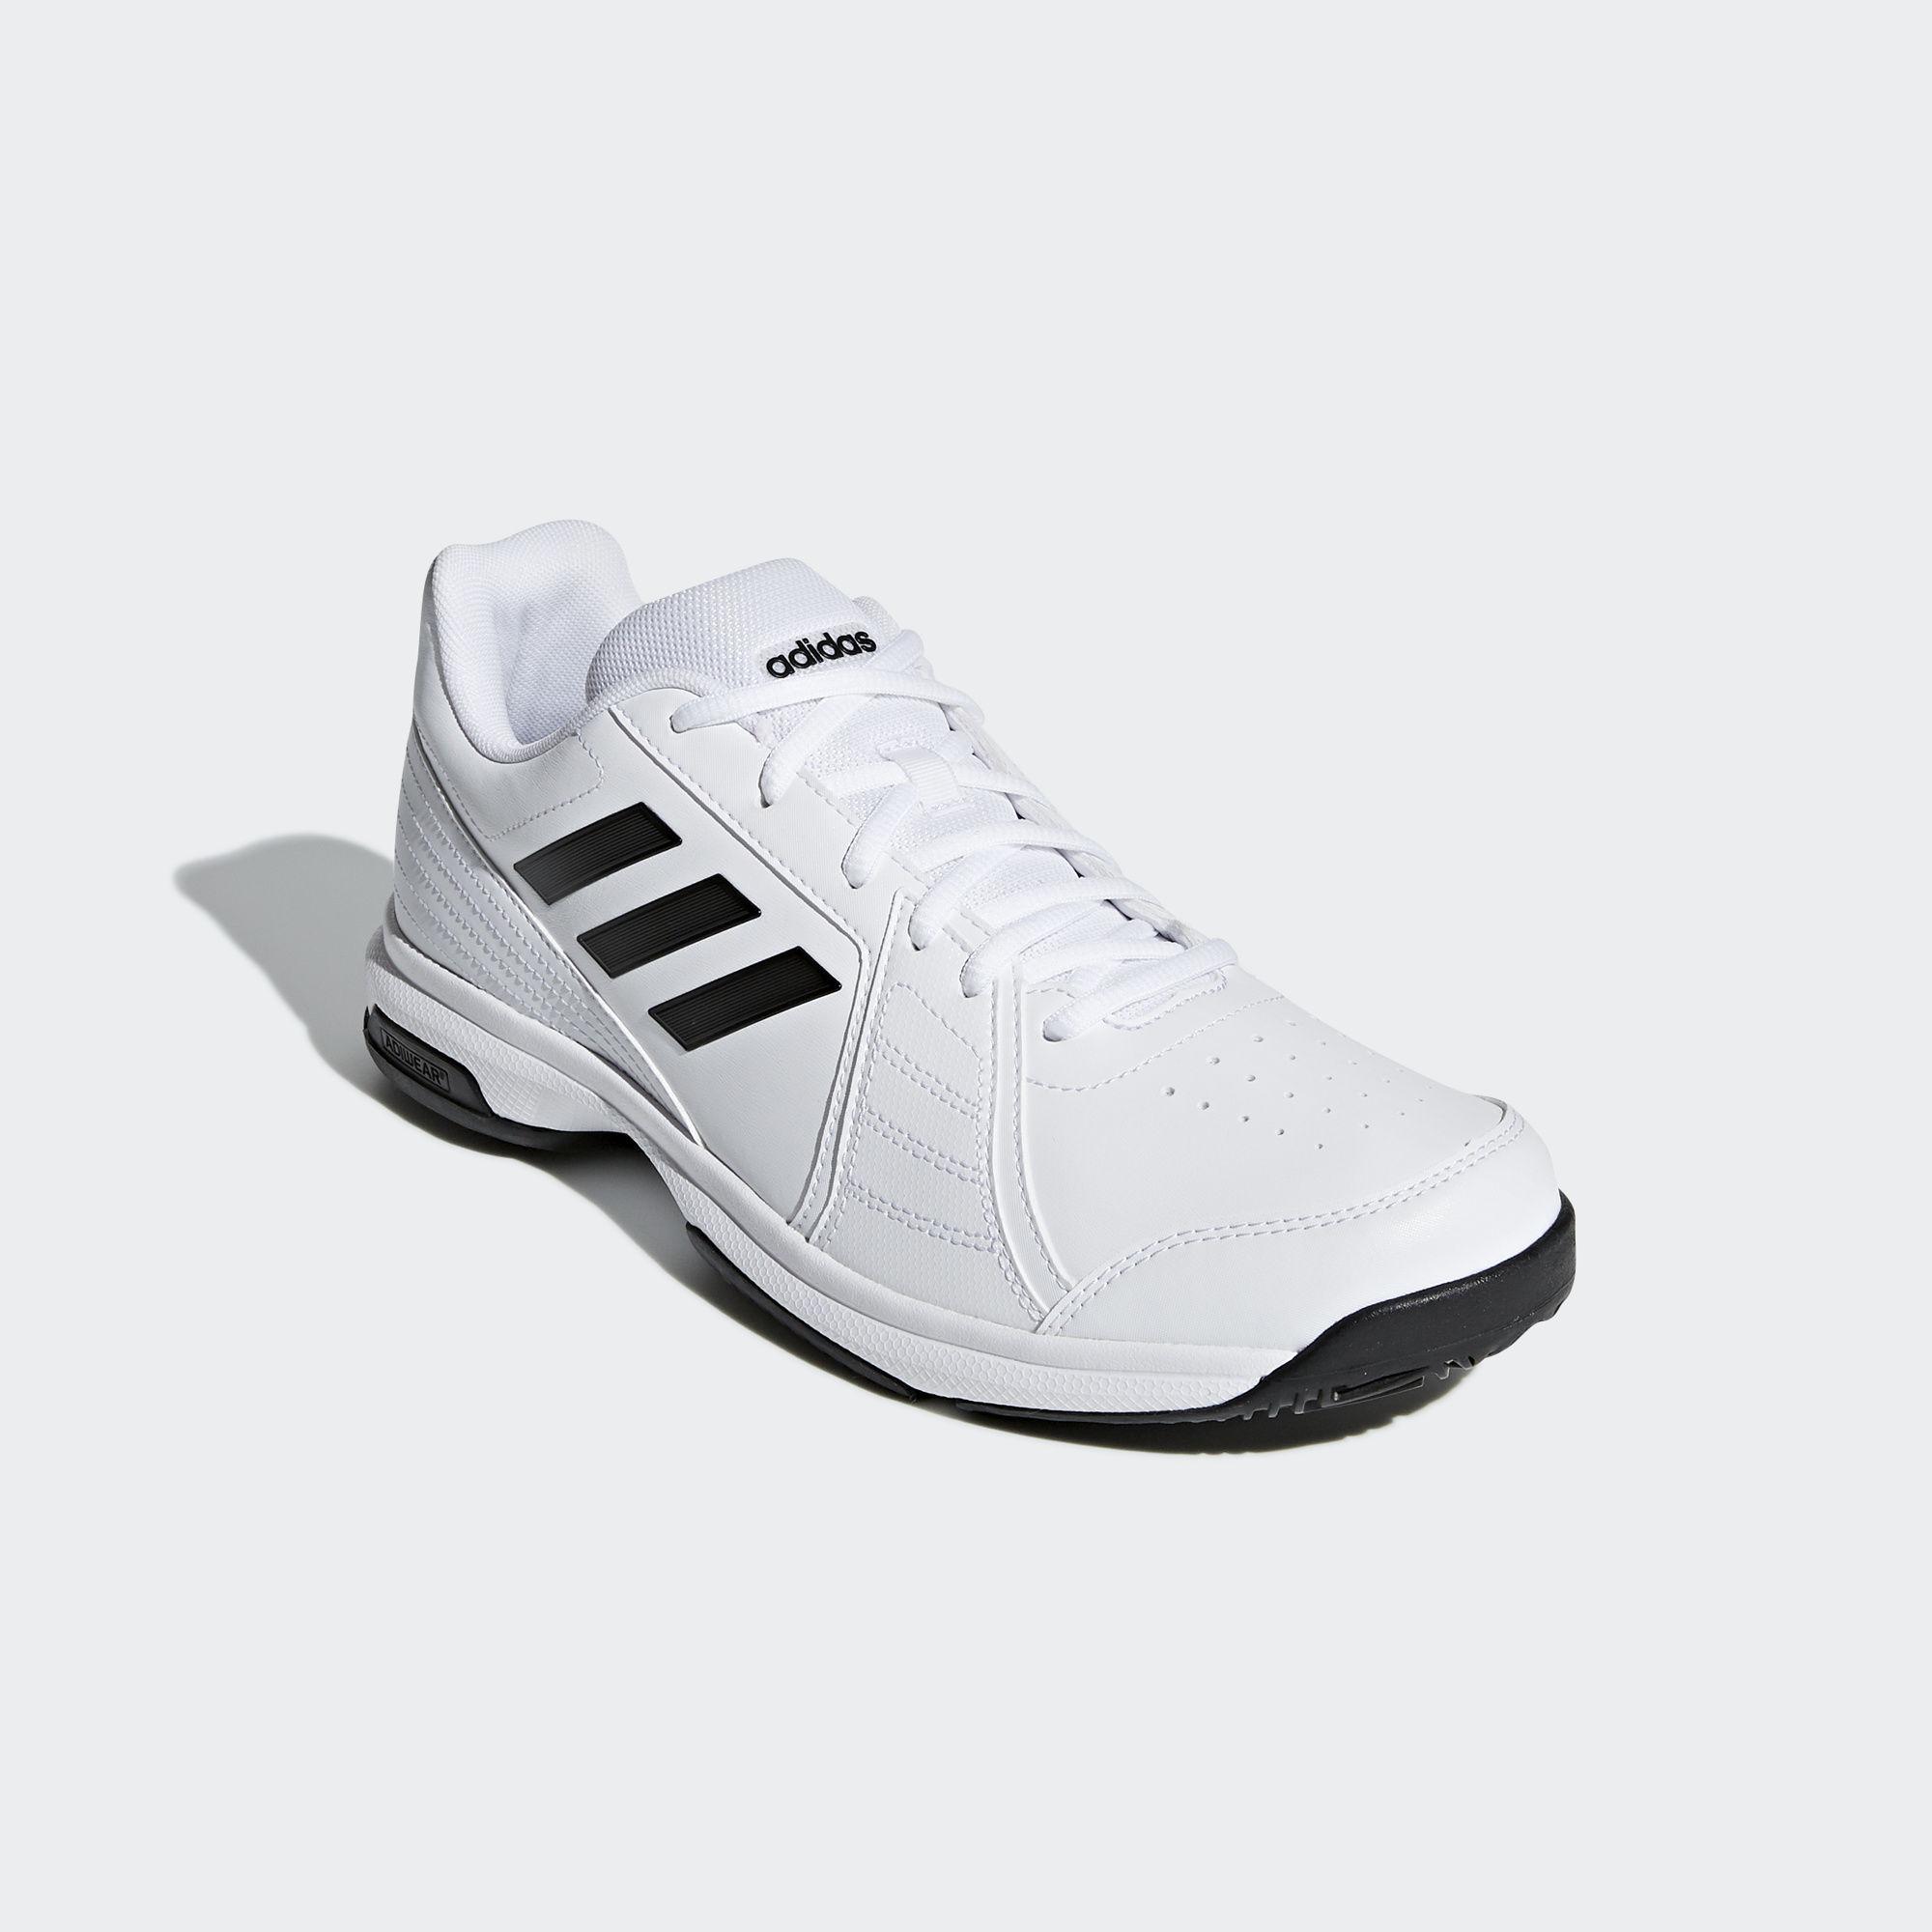 Кроссовки для тенниса Approach BB7664 adidas Performance - Украина ... adc536f8a59